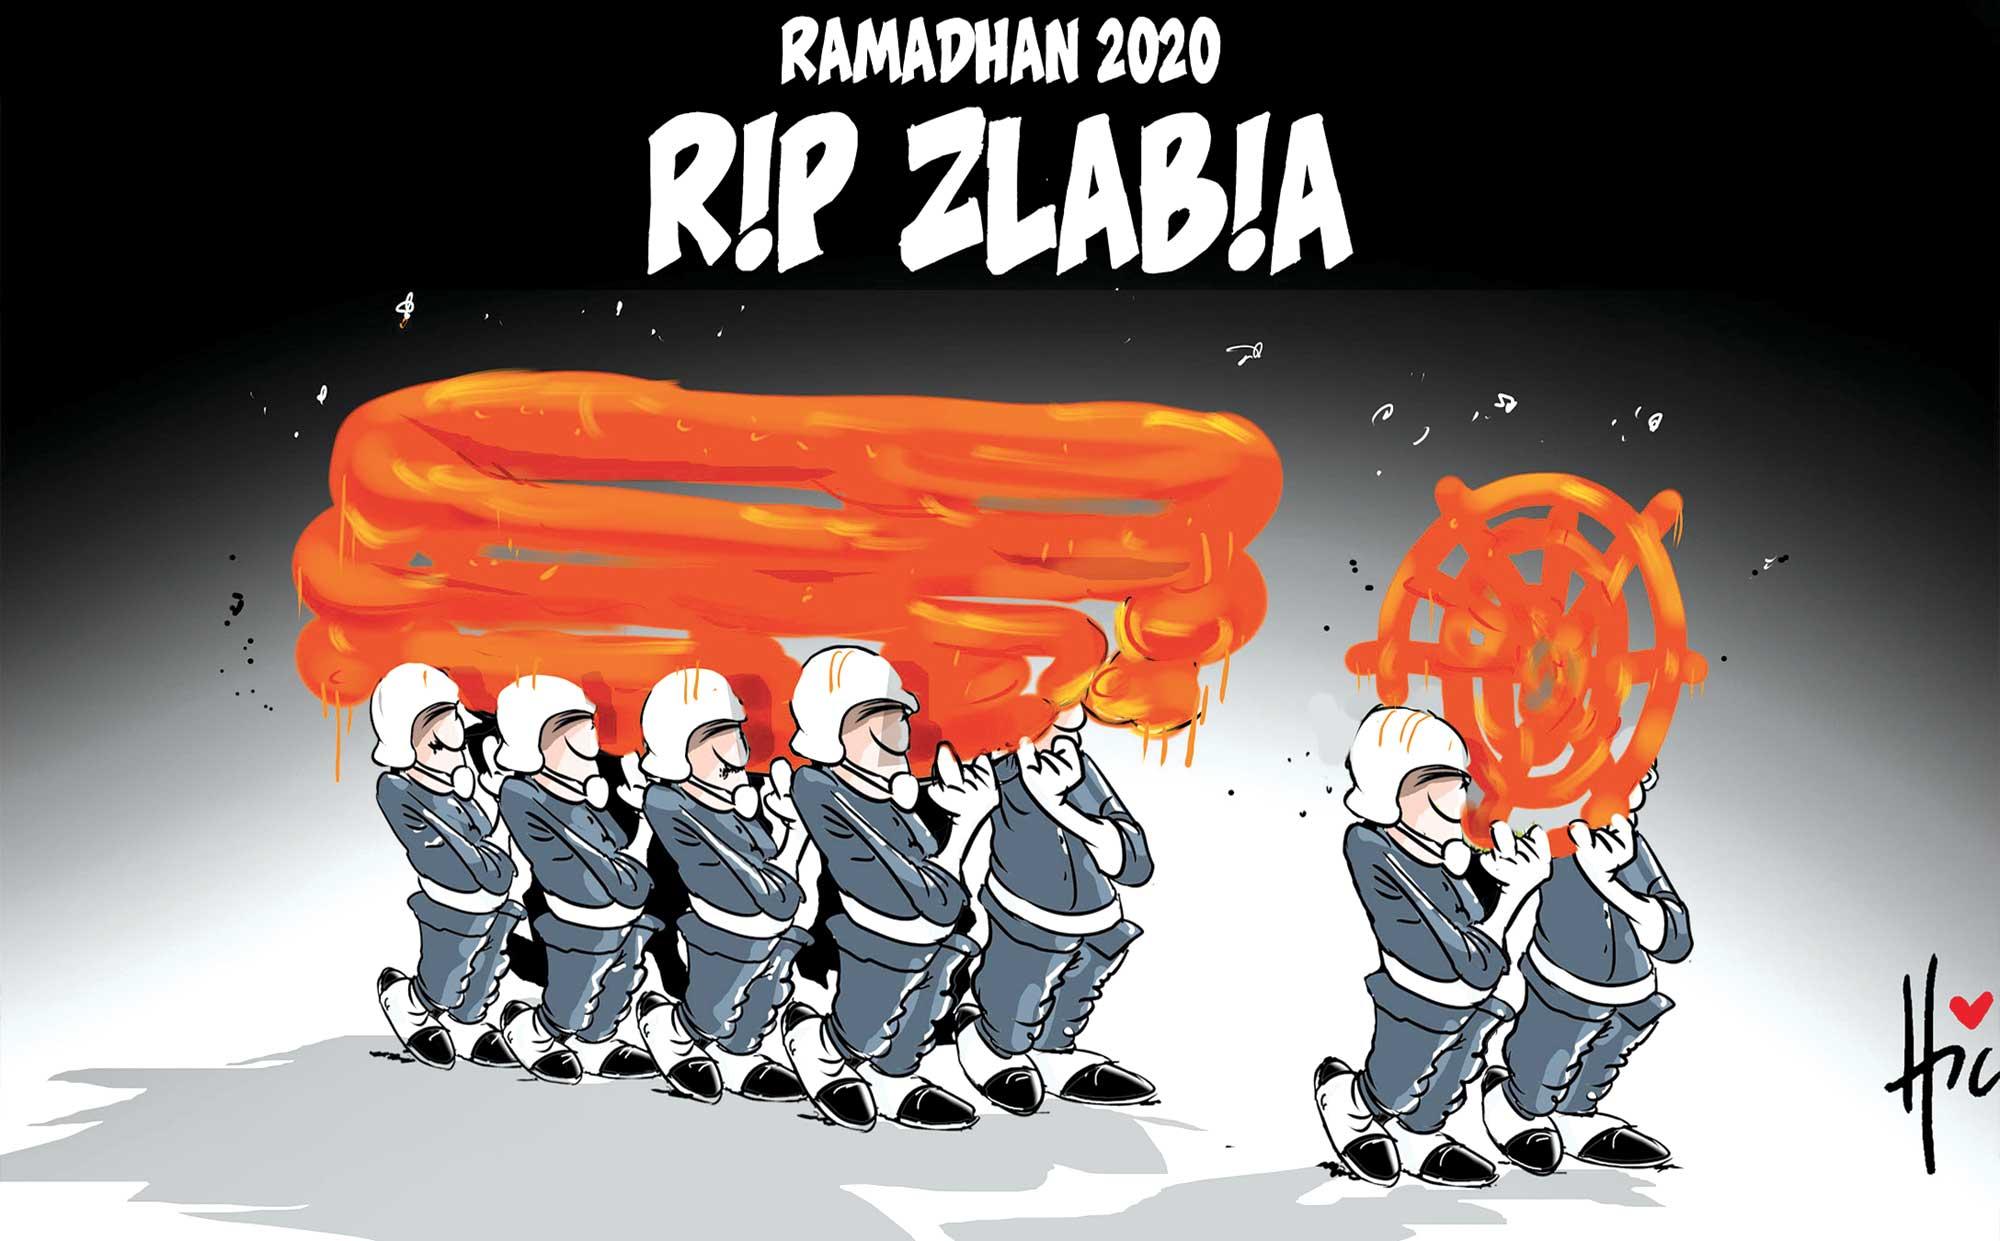 ramadan 2020 : Rest in peace zlabia - Ramadan - Gagdz.com